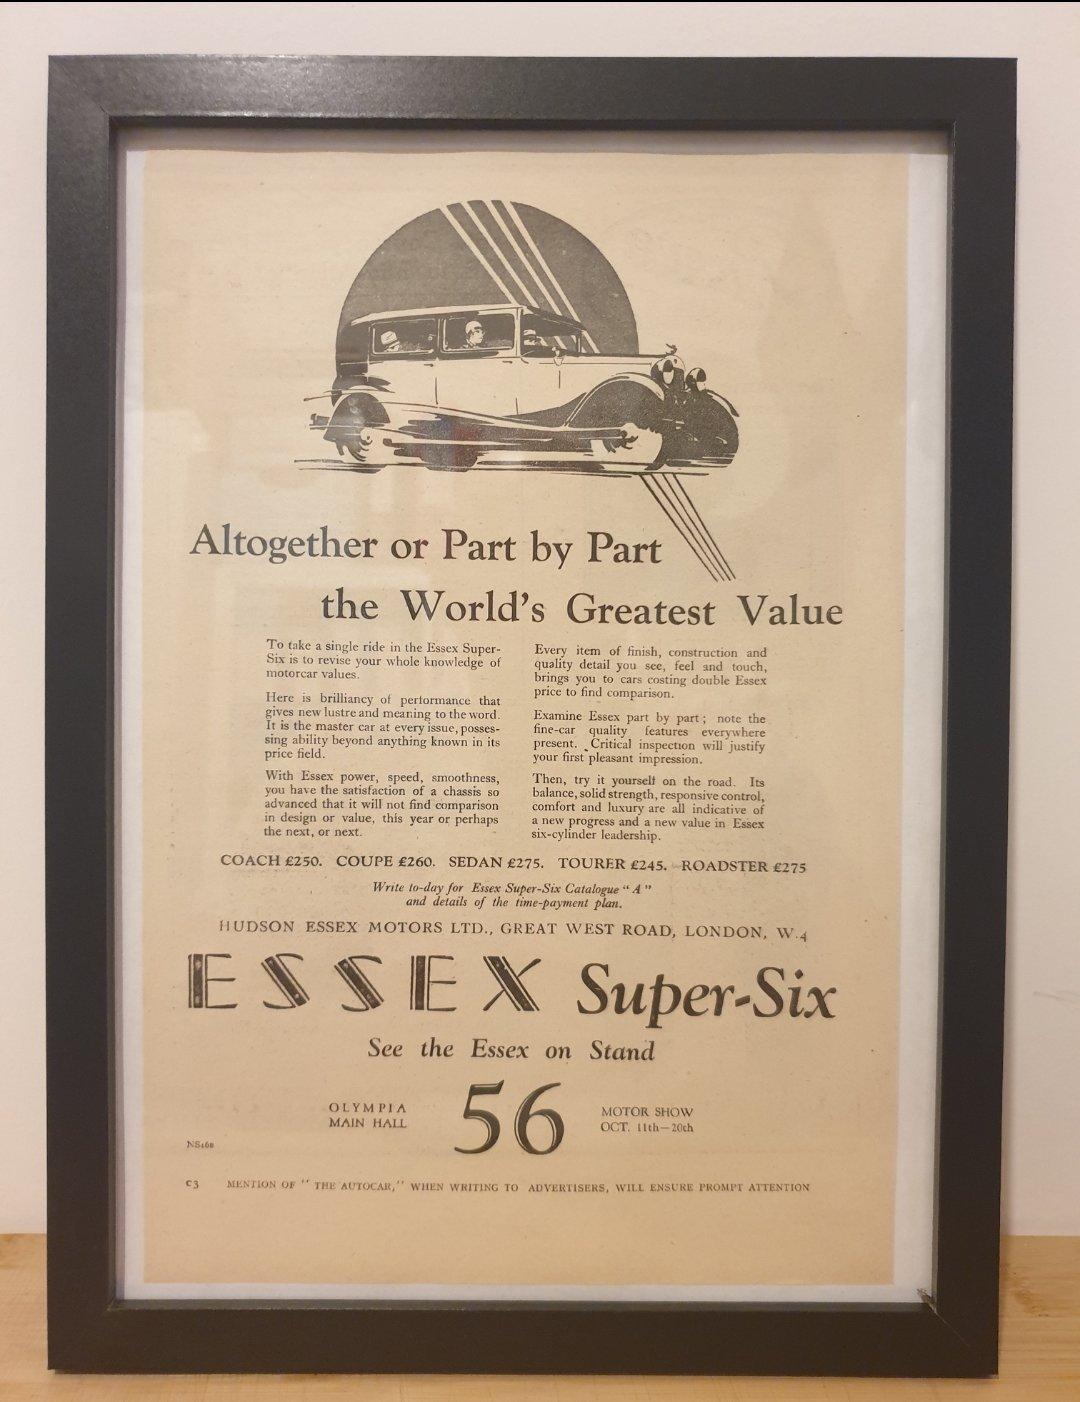 1963 Original 1928 Essex Super Six Framed Advert  For Sale (picture 1 of 3)